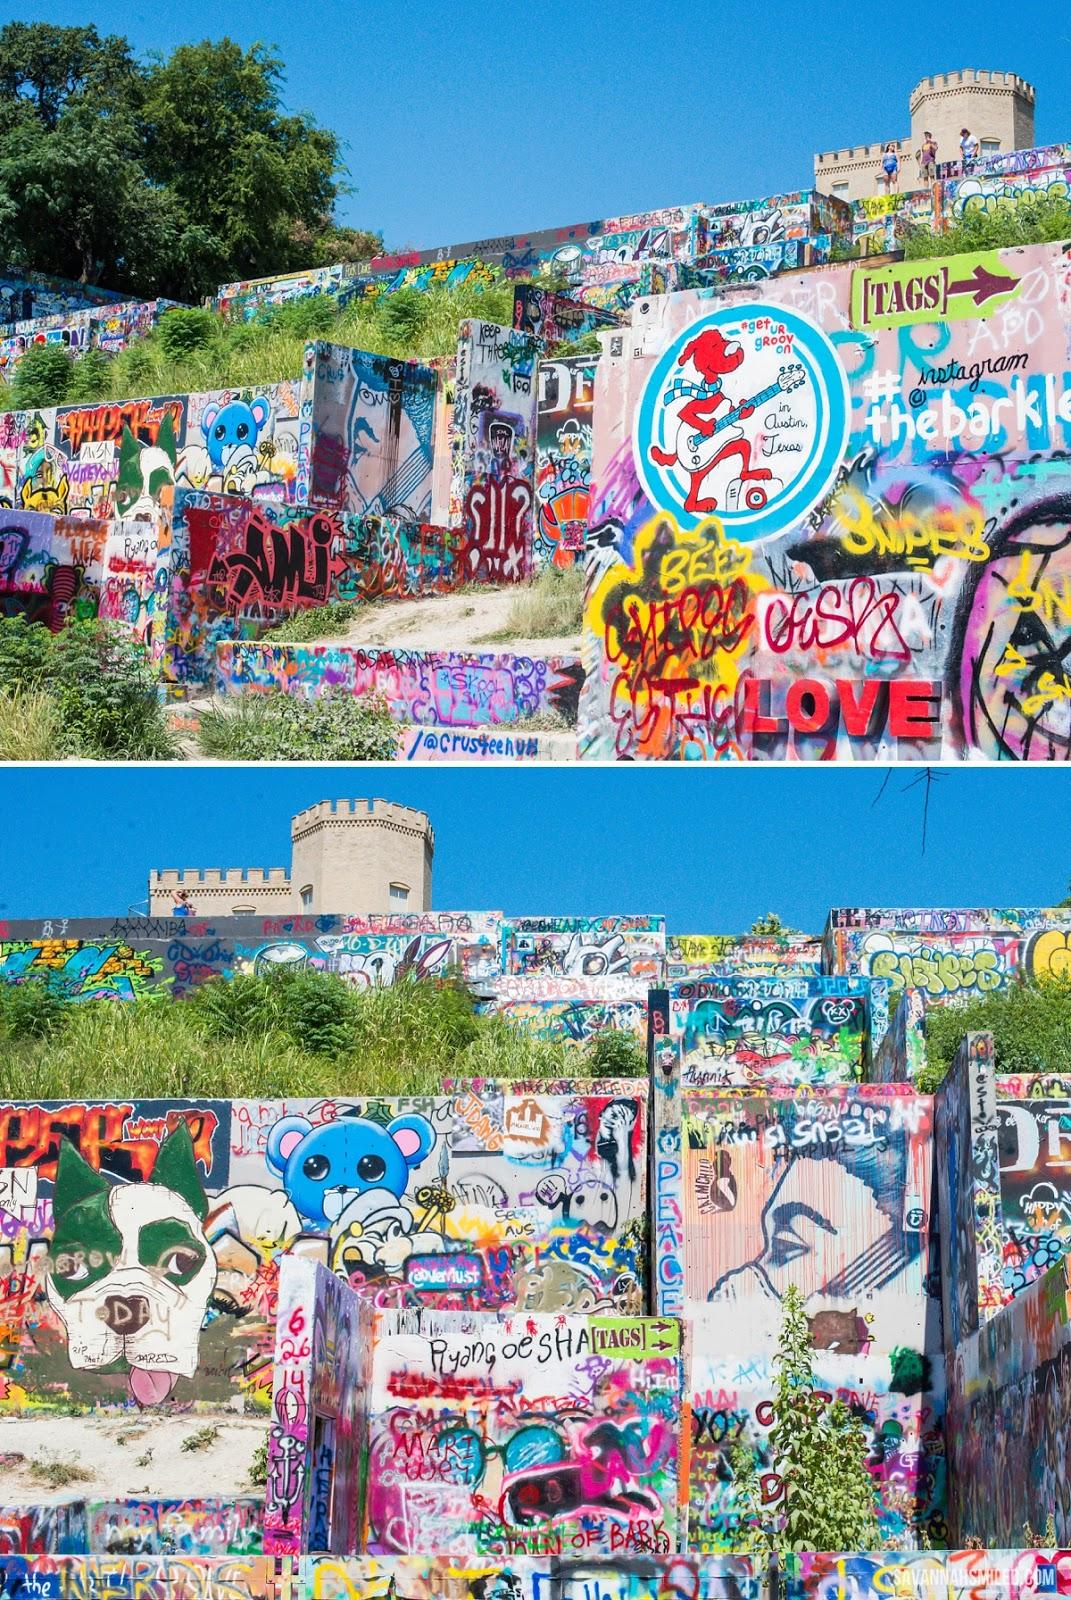 austin-graffiti-hope-outdoor-gallery-22.jpg